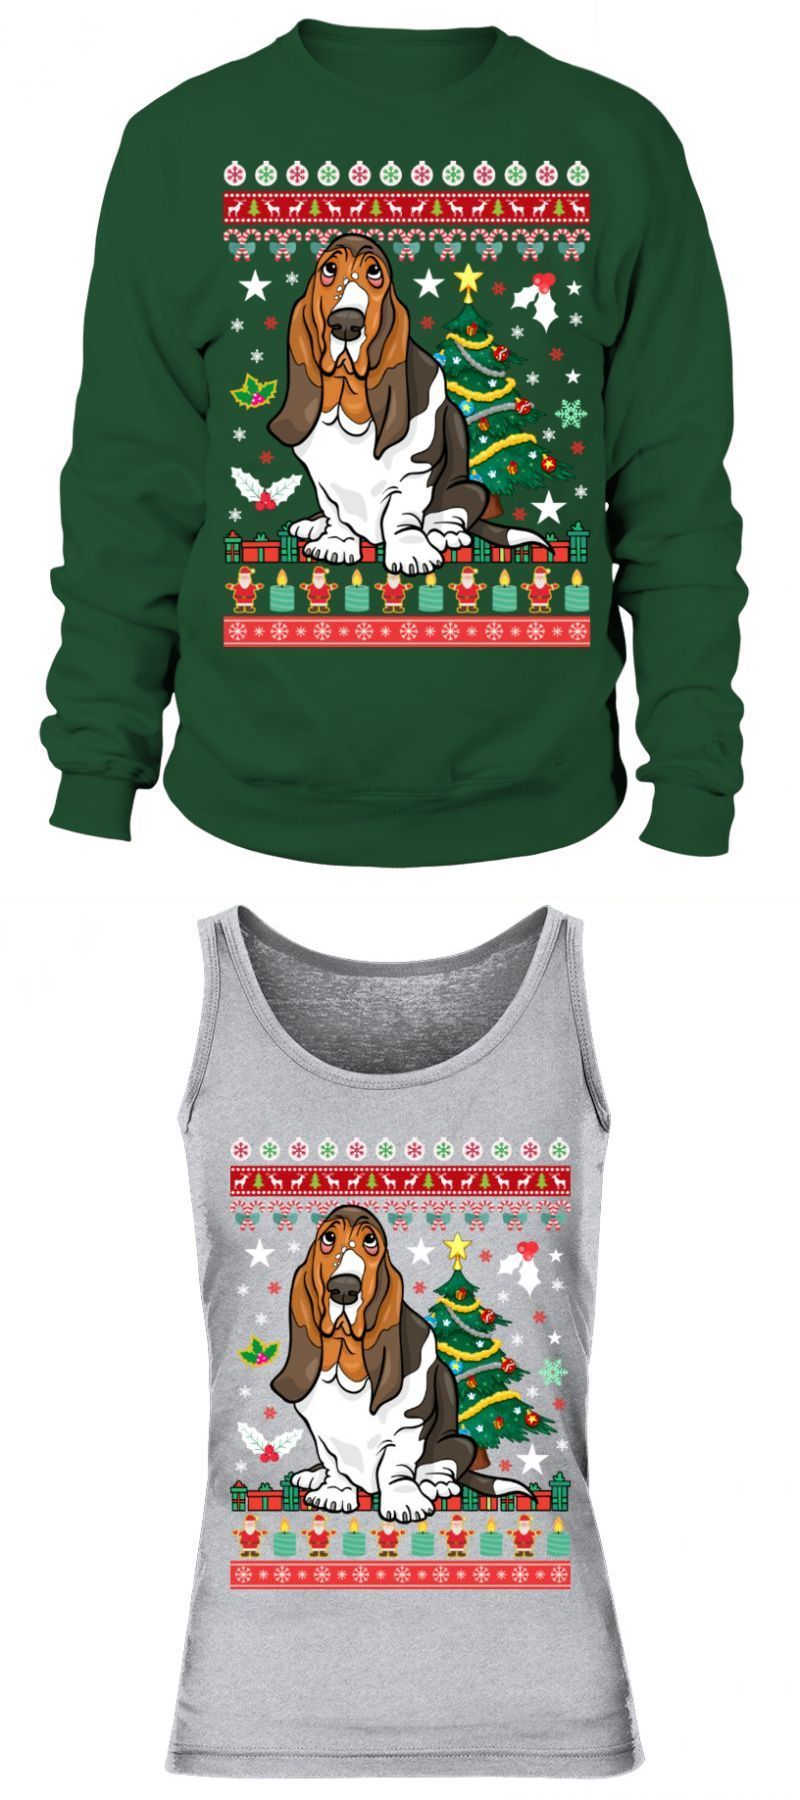 Couple T Shirt Colombo Basset Hound Christmas Sweatshirt Couple T